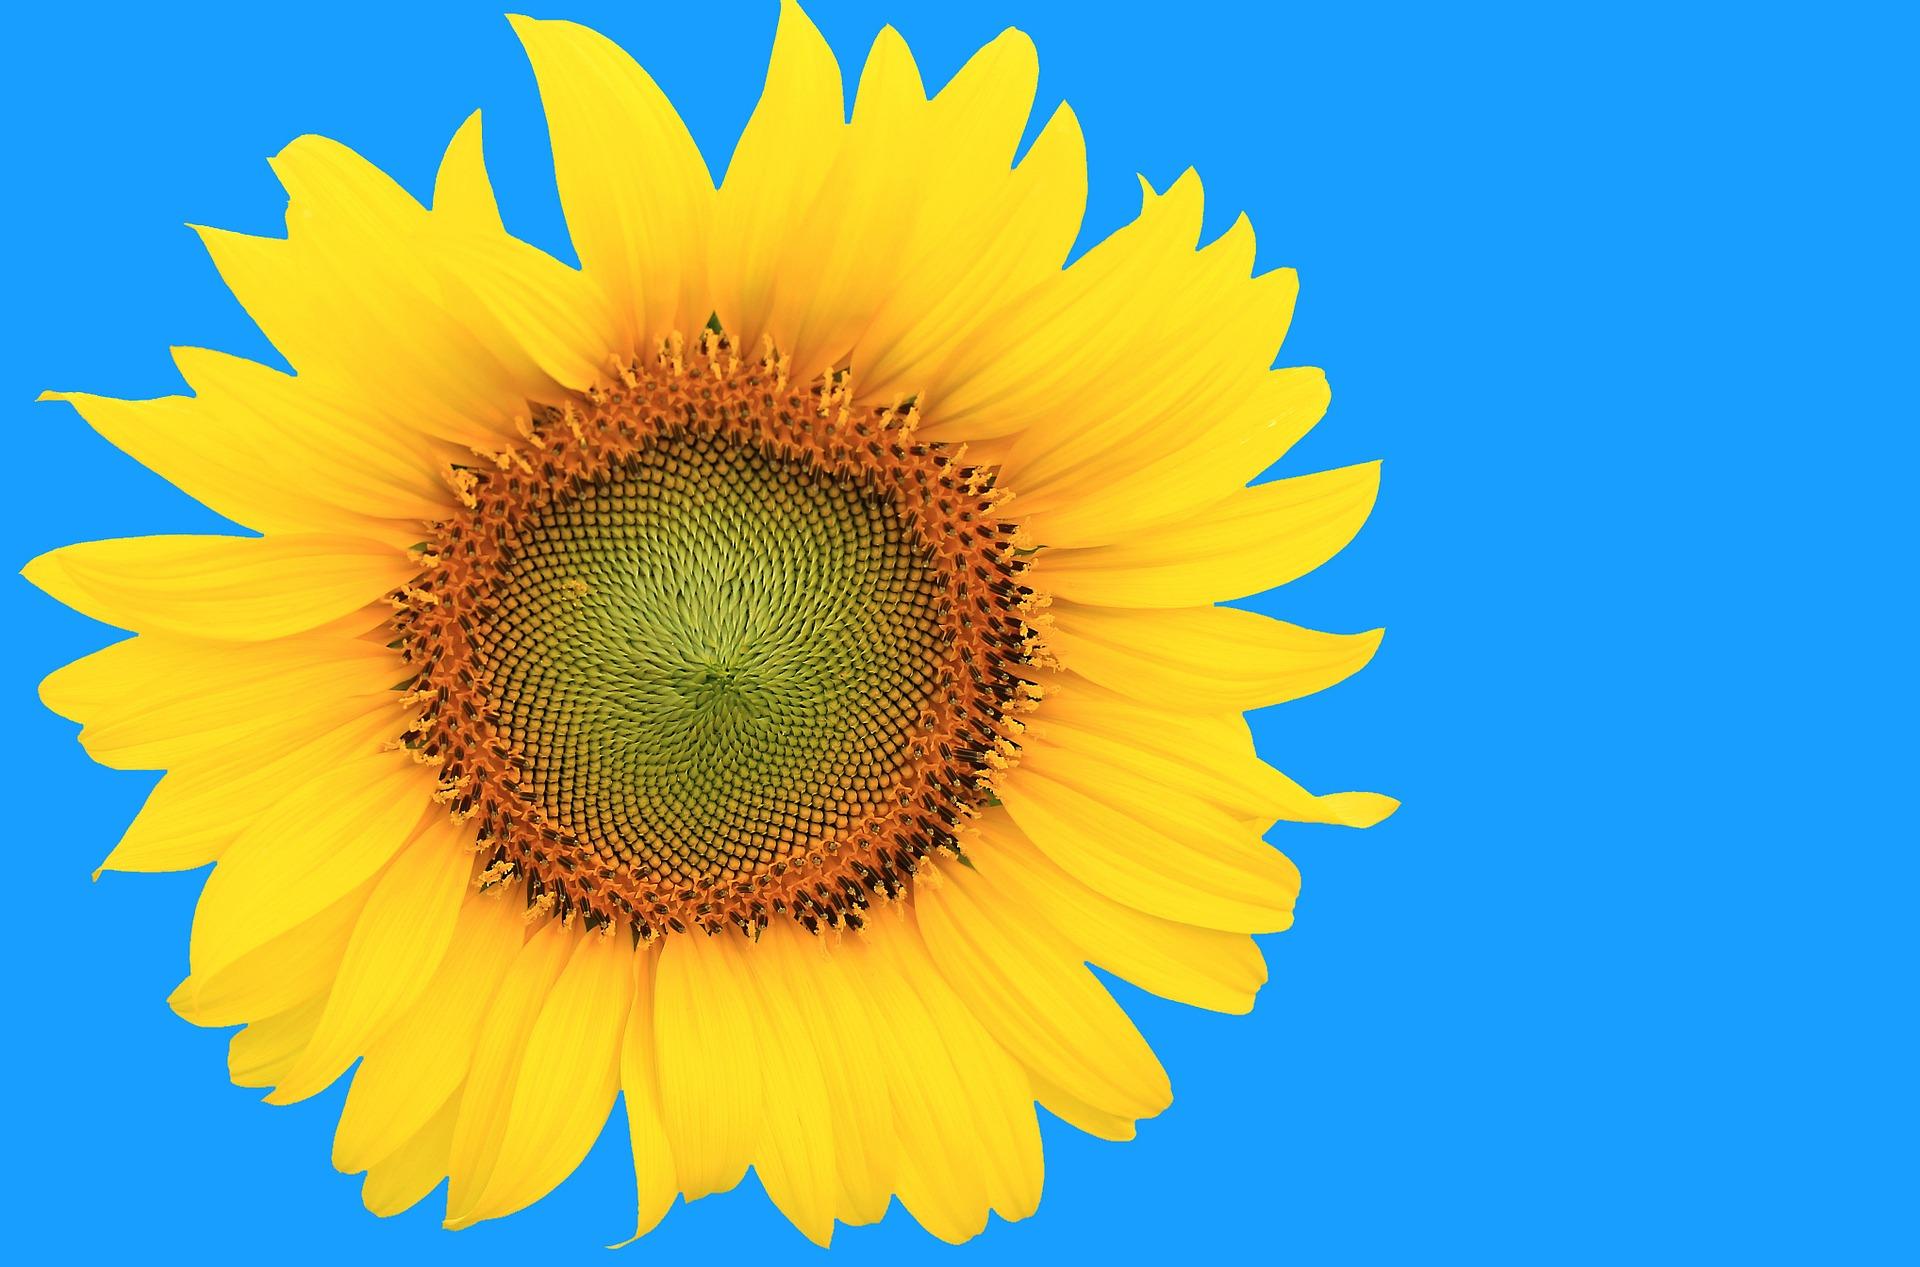 sunflower-804669_1920